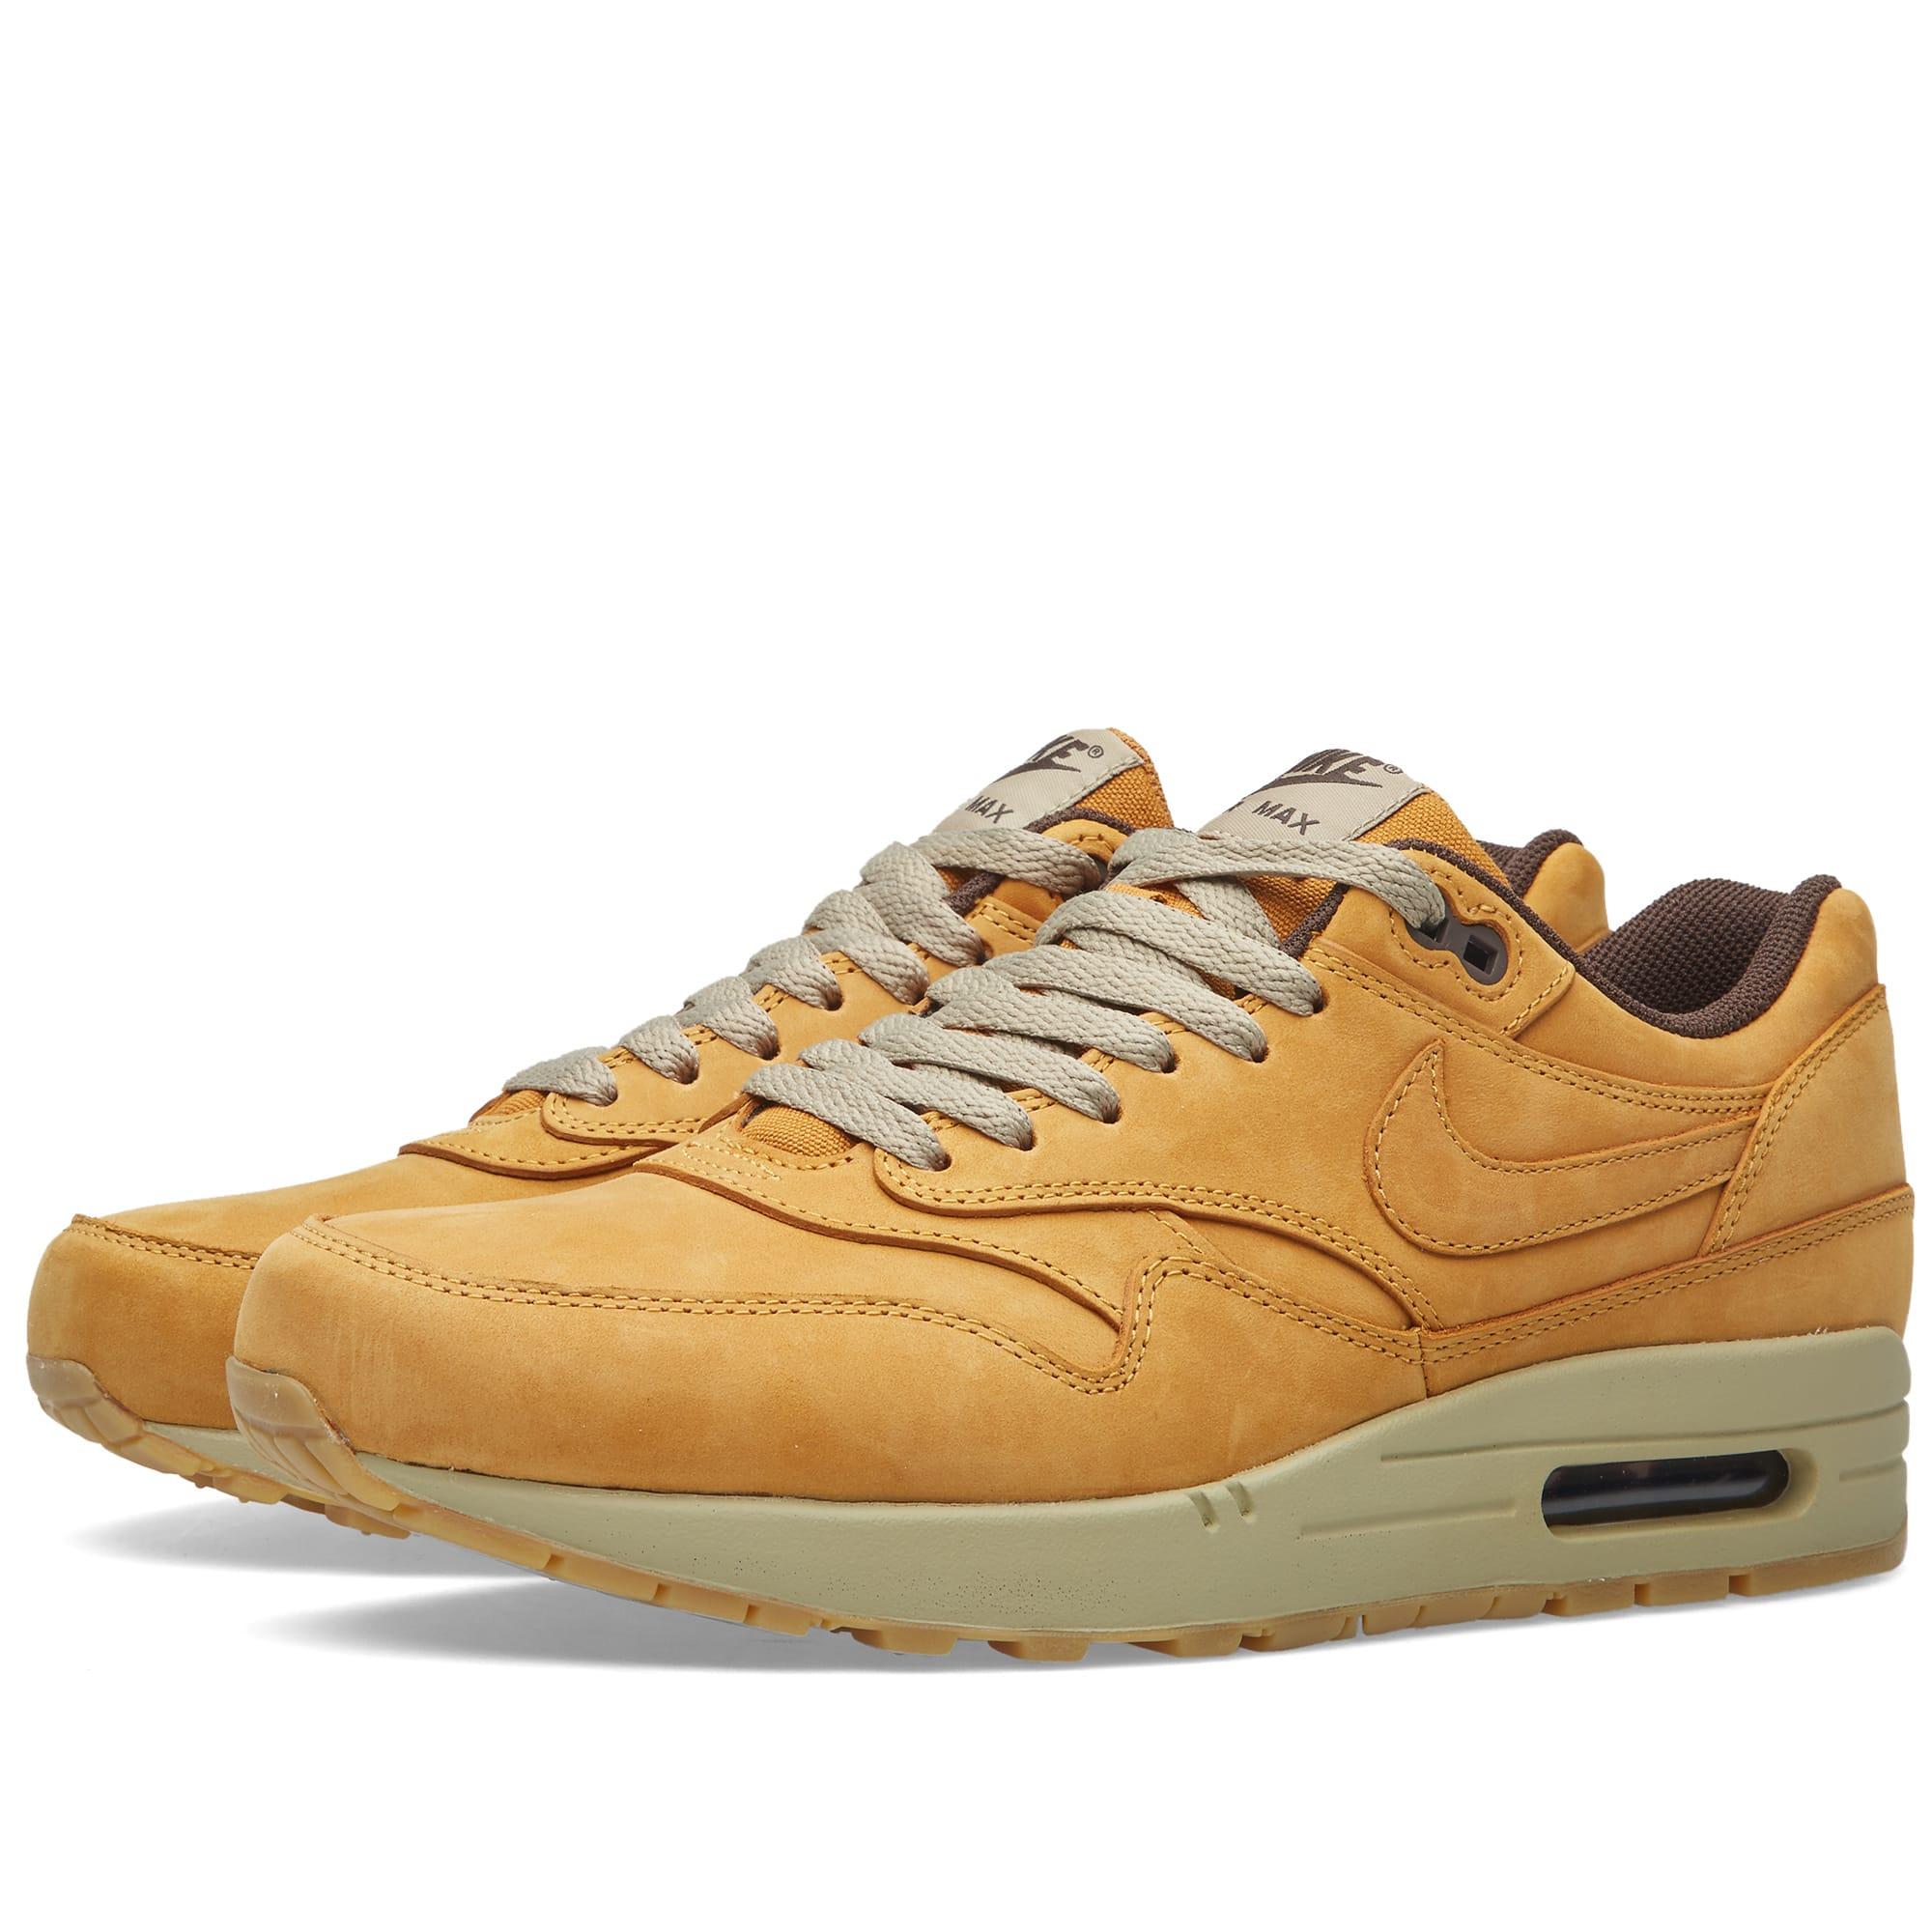 sports shoes 859e2 42738 Nike Air Max 1 Leather Premium  Wheat . Bronze   Baroque Brown